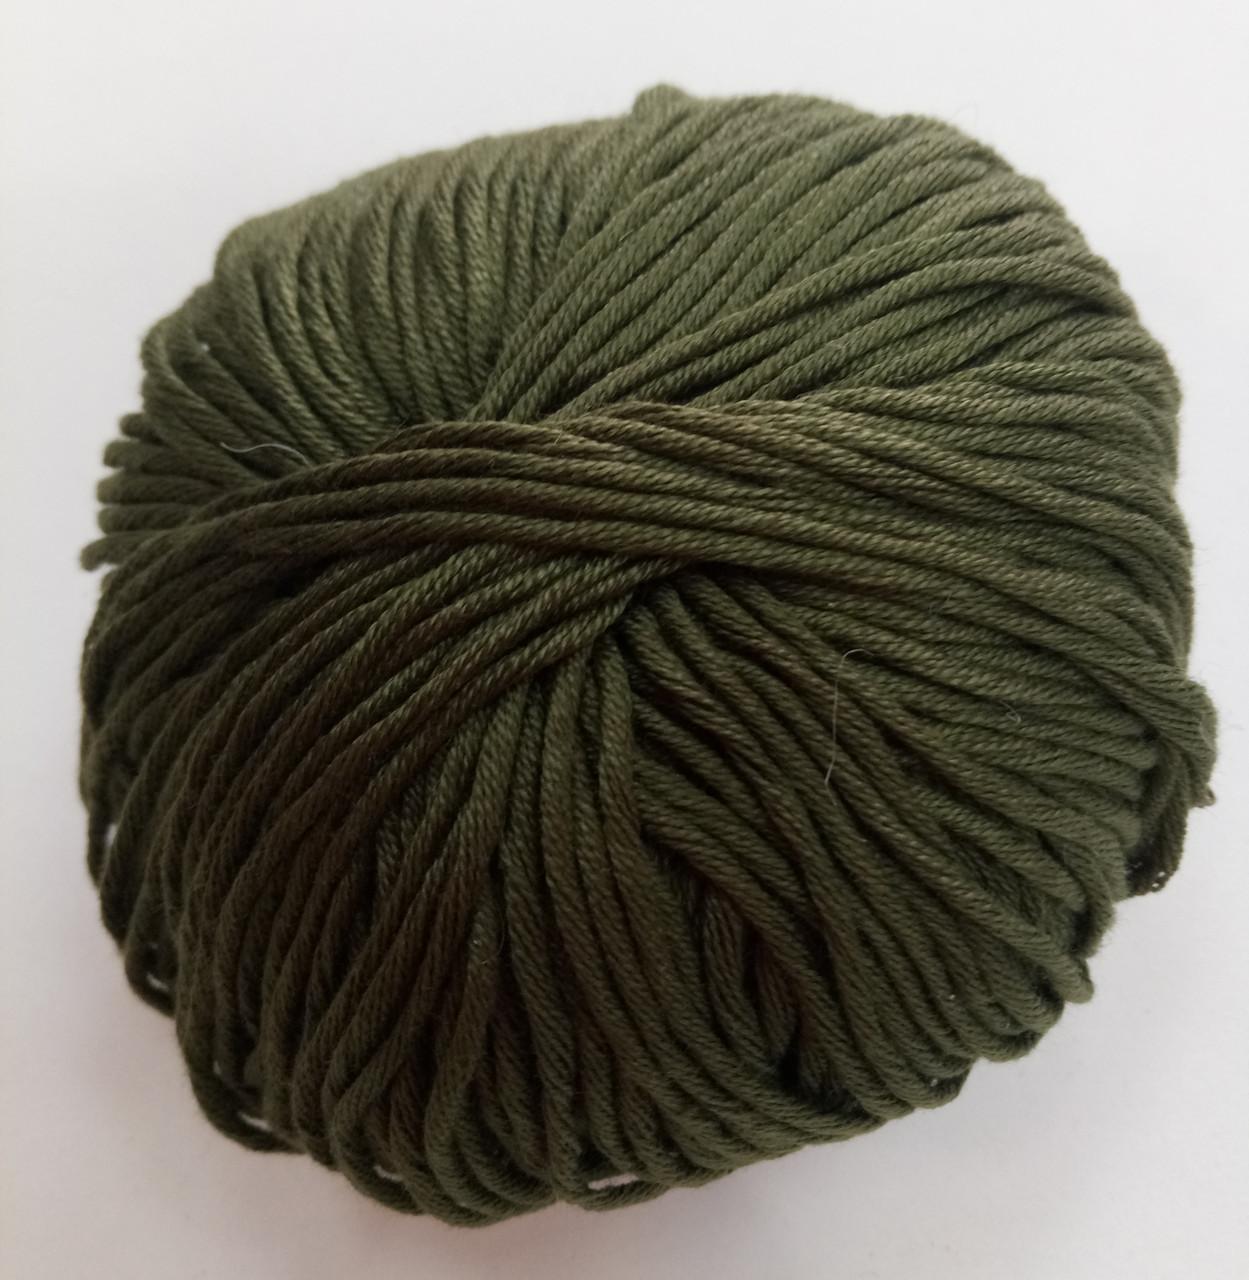 Пряжа для вязания Эджитто TITAN WOOL болото 35